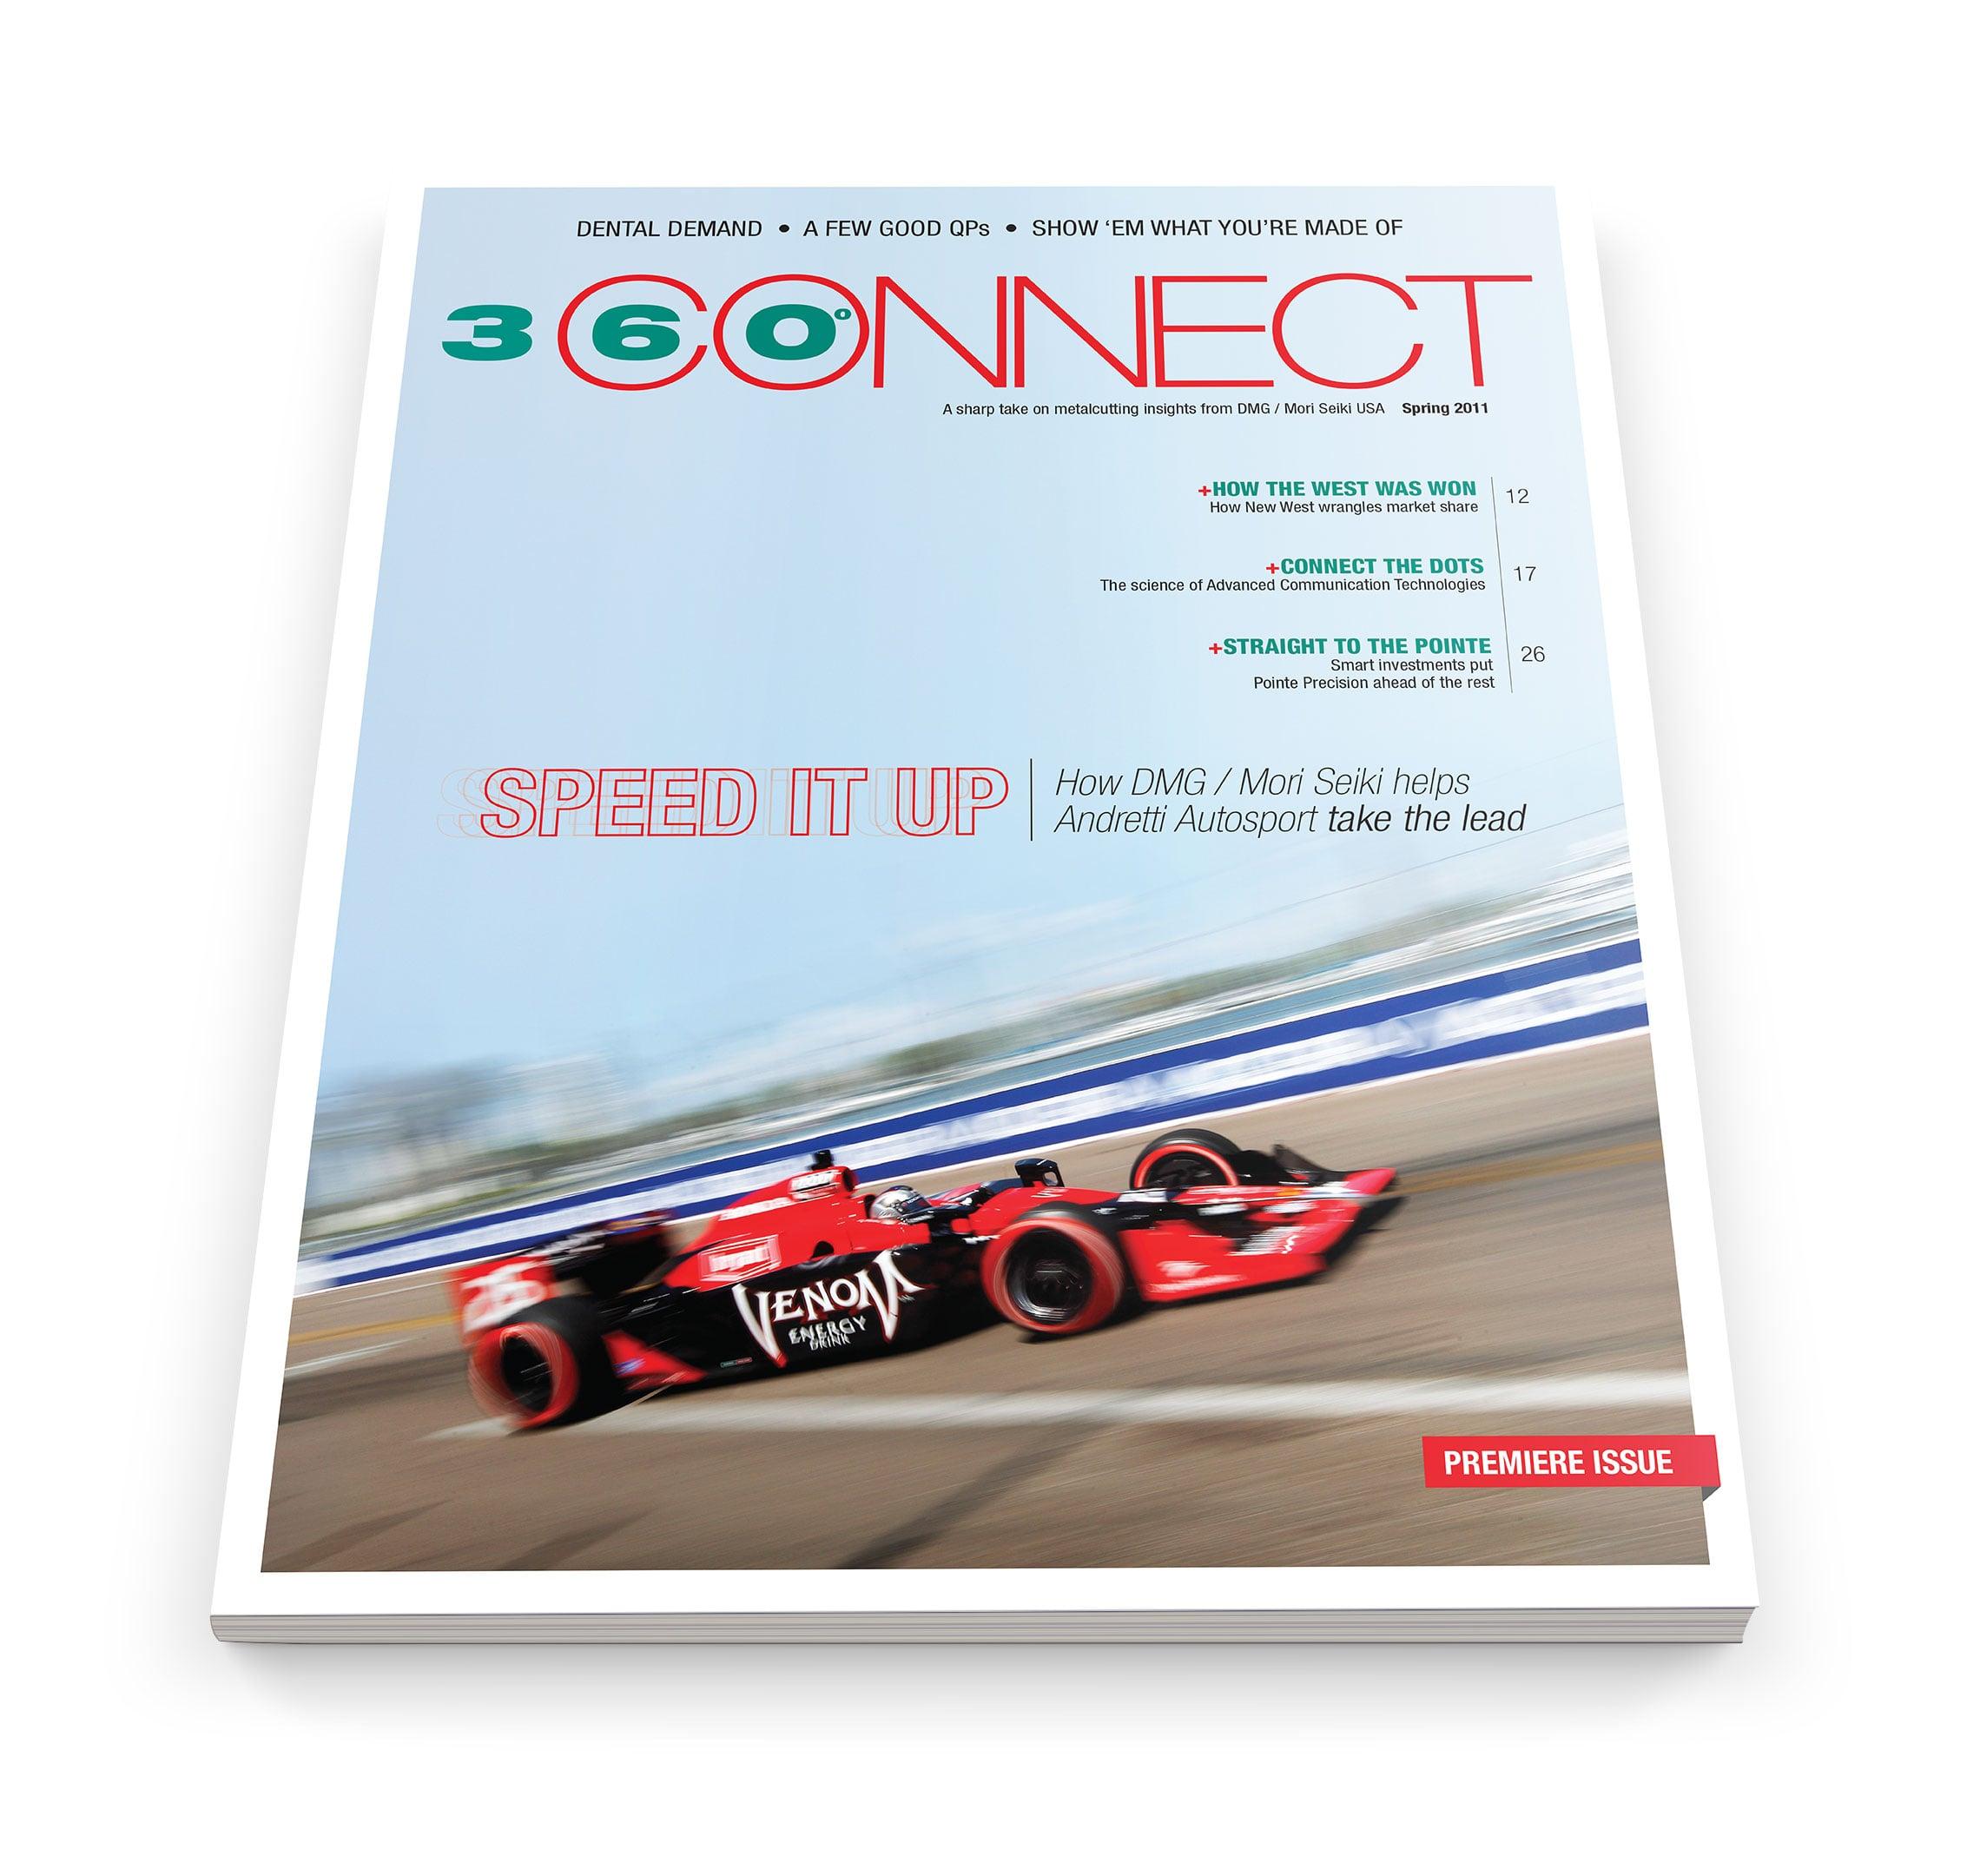 dmori_magazine_cover_3.jpg